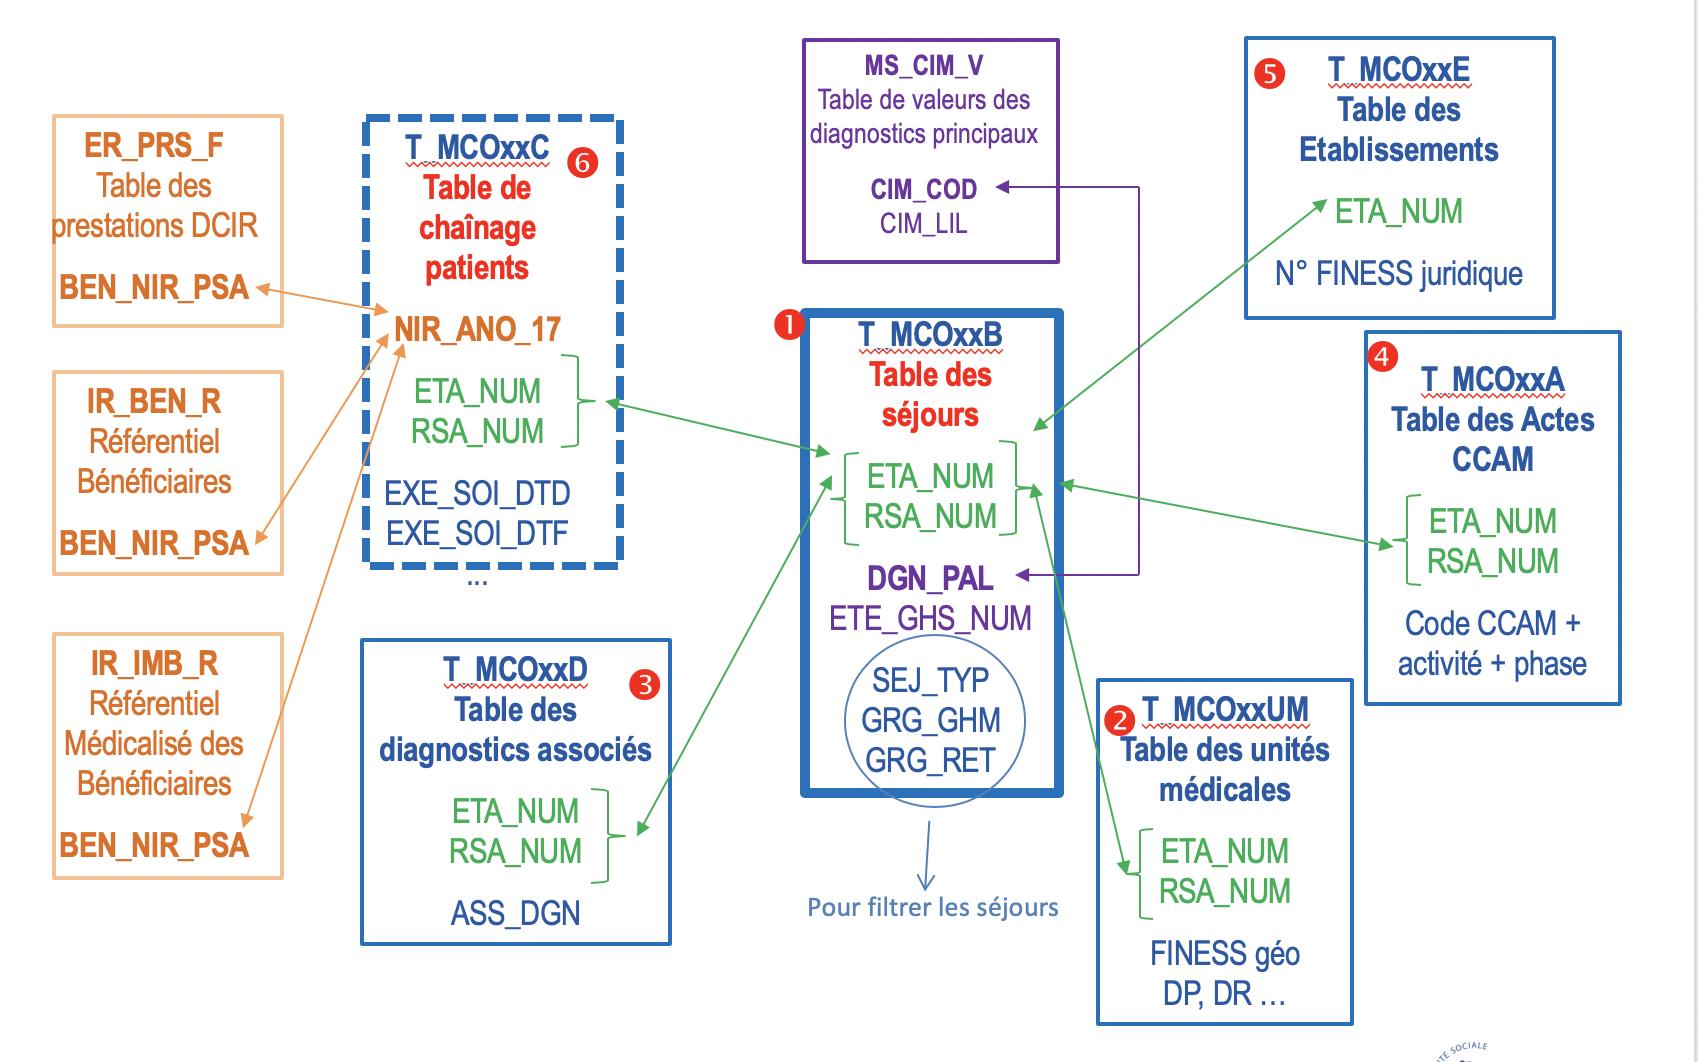 schéma structuration pmsi MCO